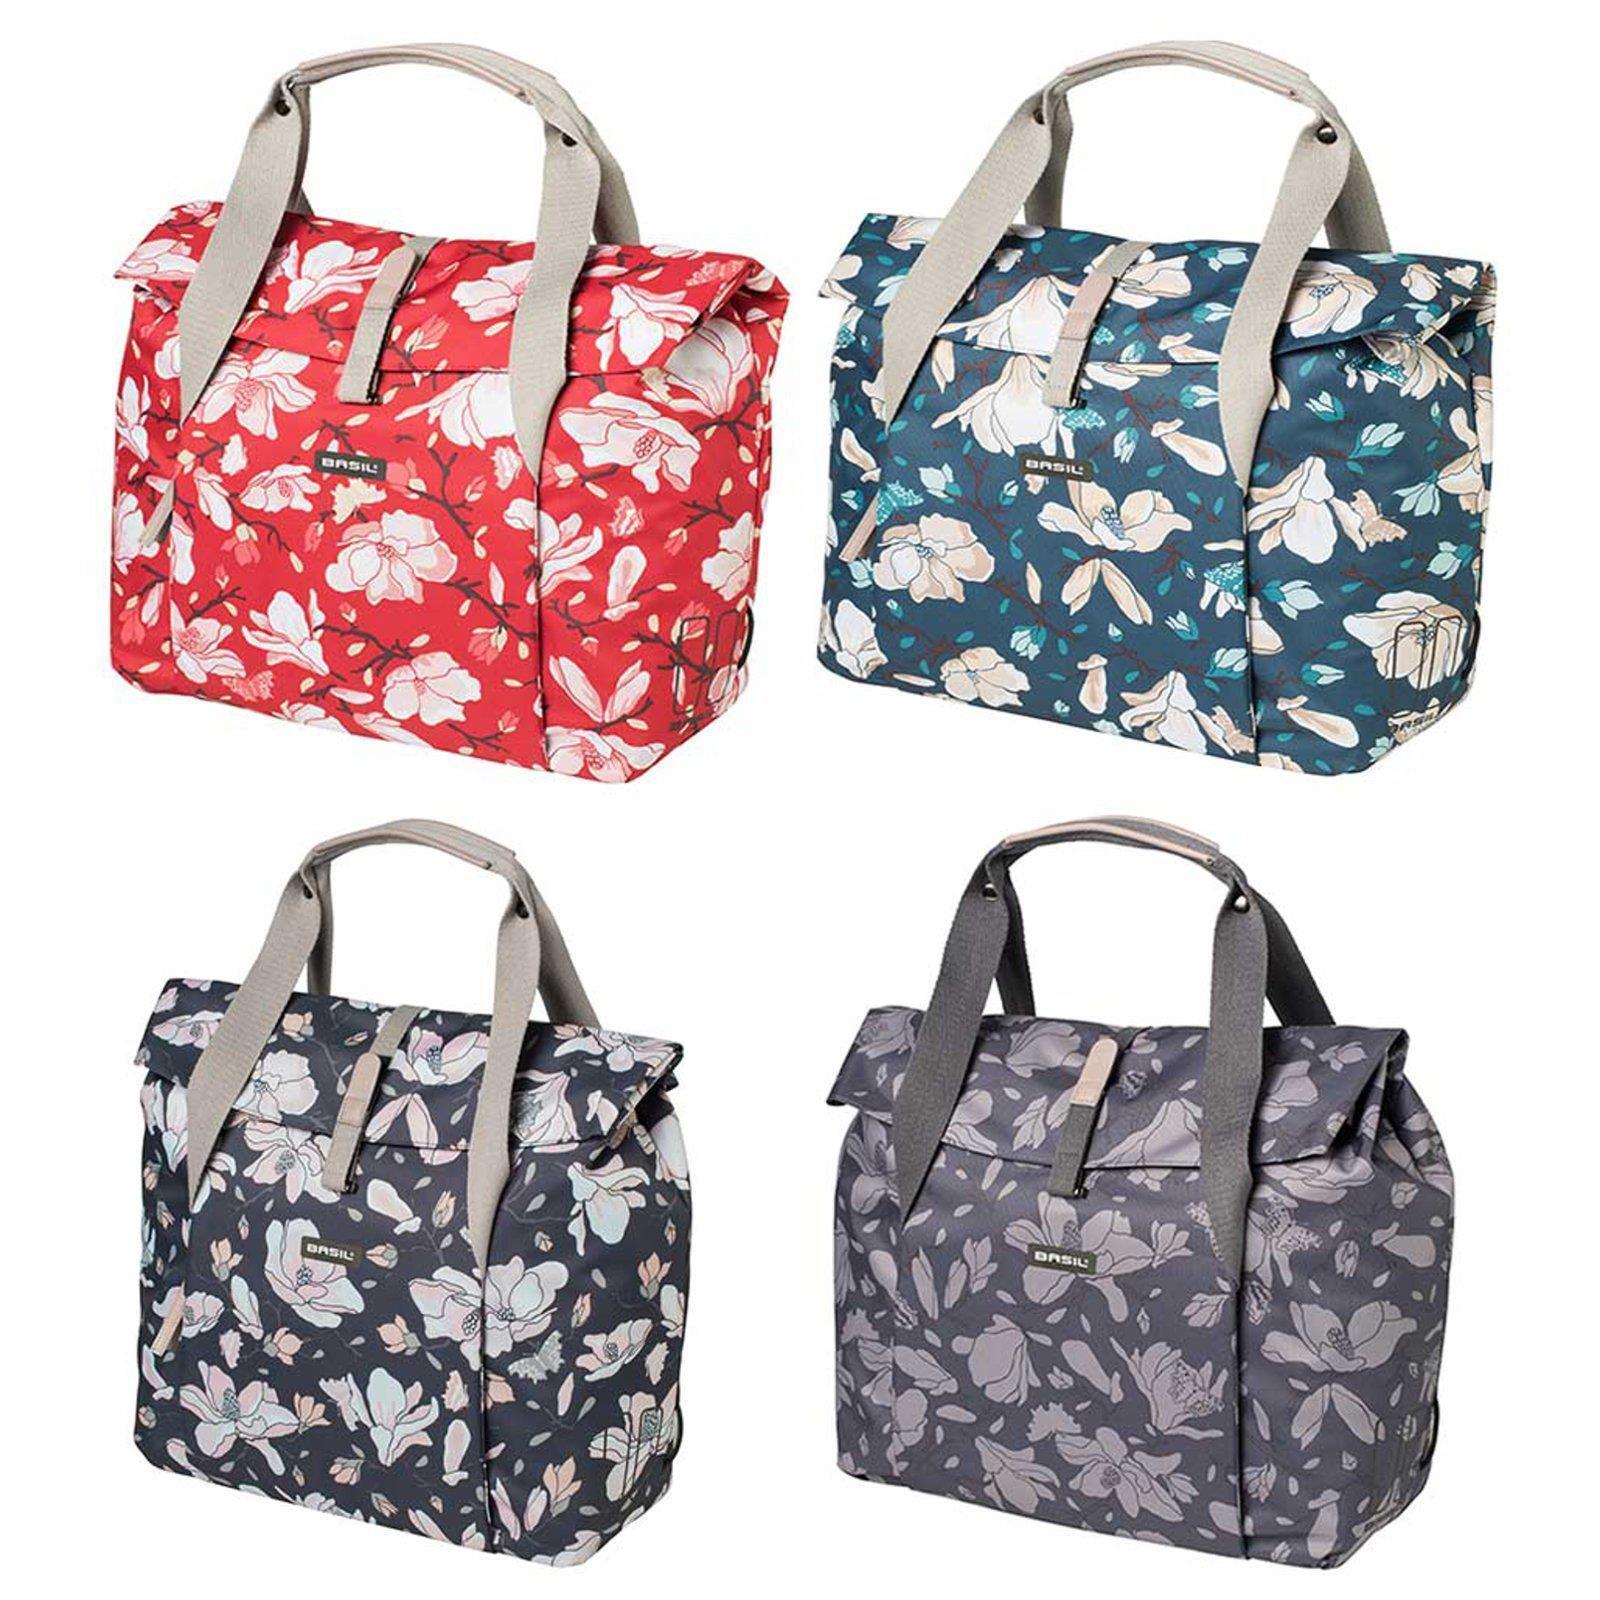 Basil Shopper Magnolia Handbag 18l Bicycle Womens Shoulder Carrier  Bag  zero profit